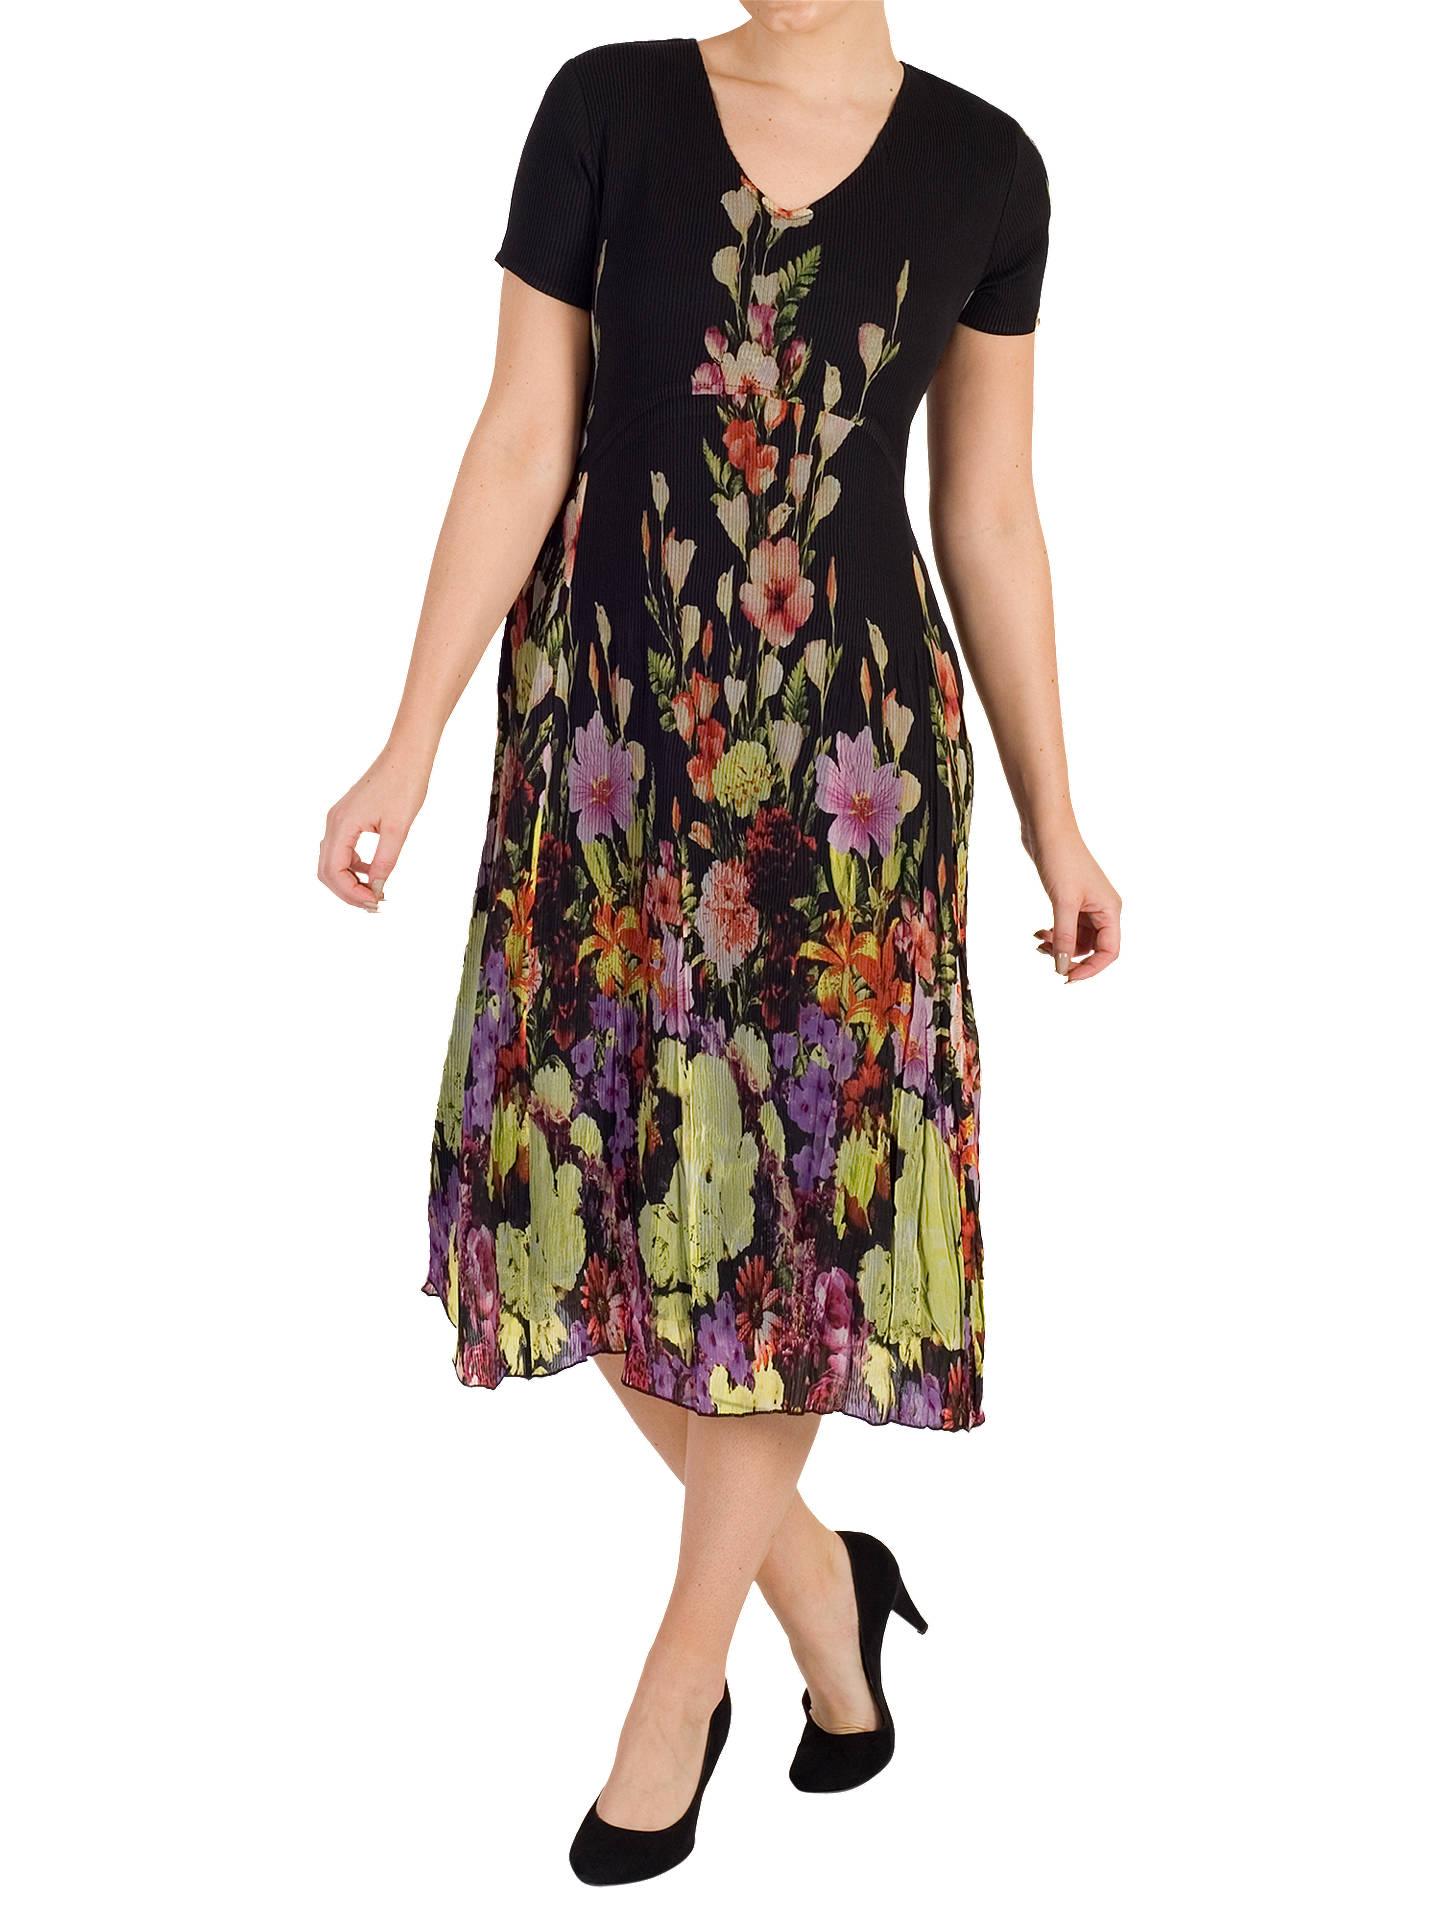 9e1c8fce665cb4 Buy Chesca Floral Border Dress, Black/Multi, 12-14 Online at johnlewis ...